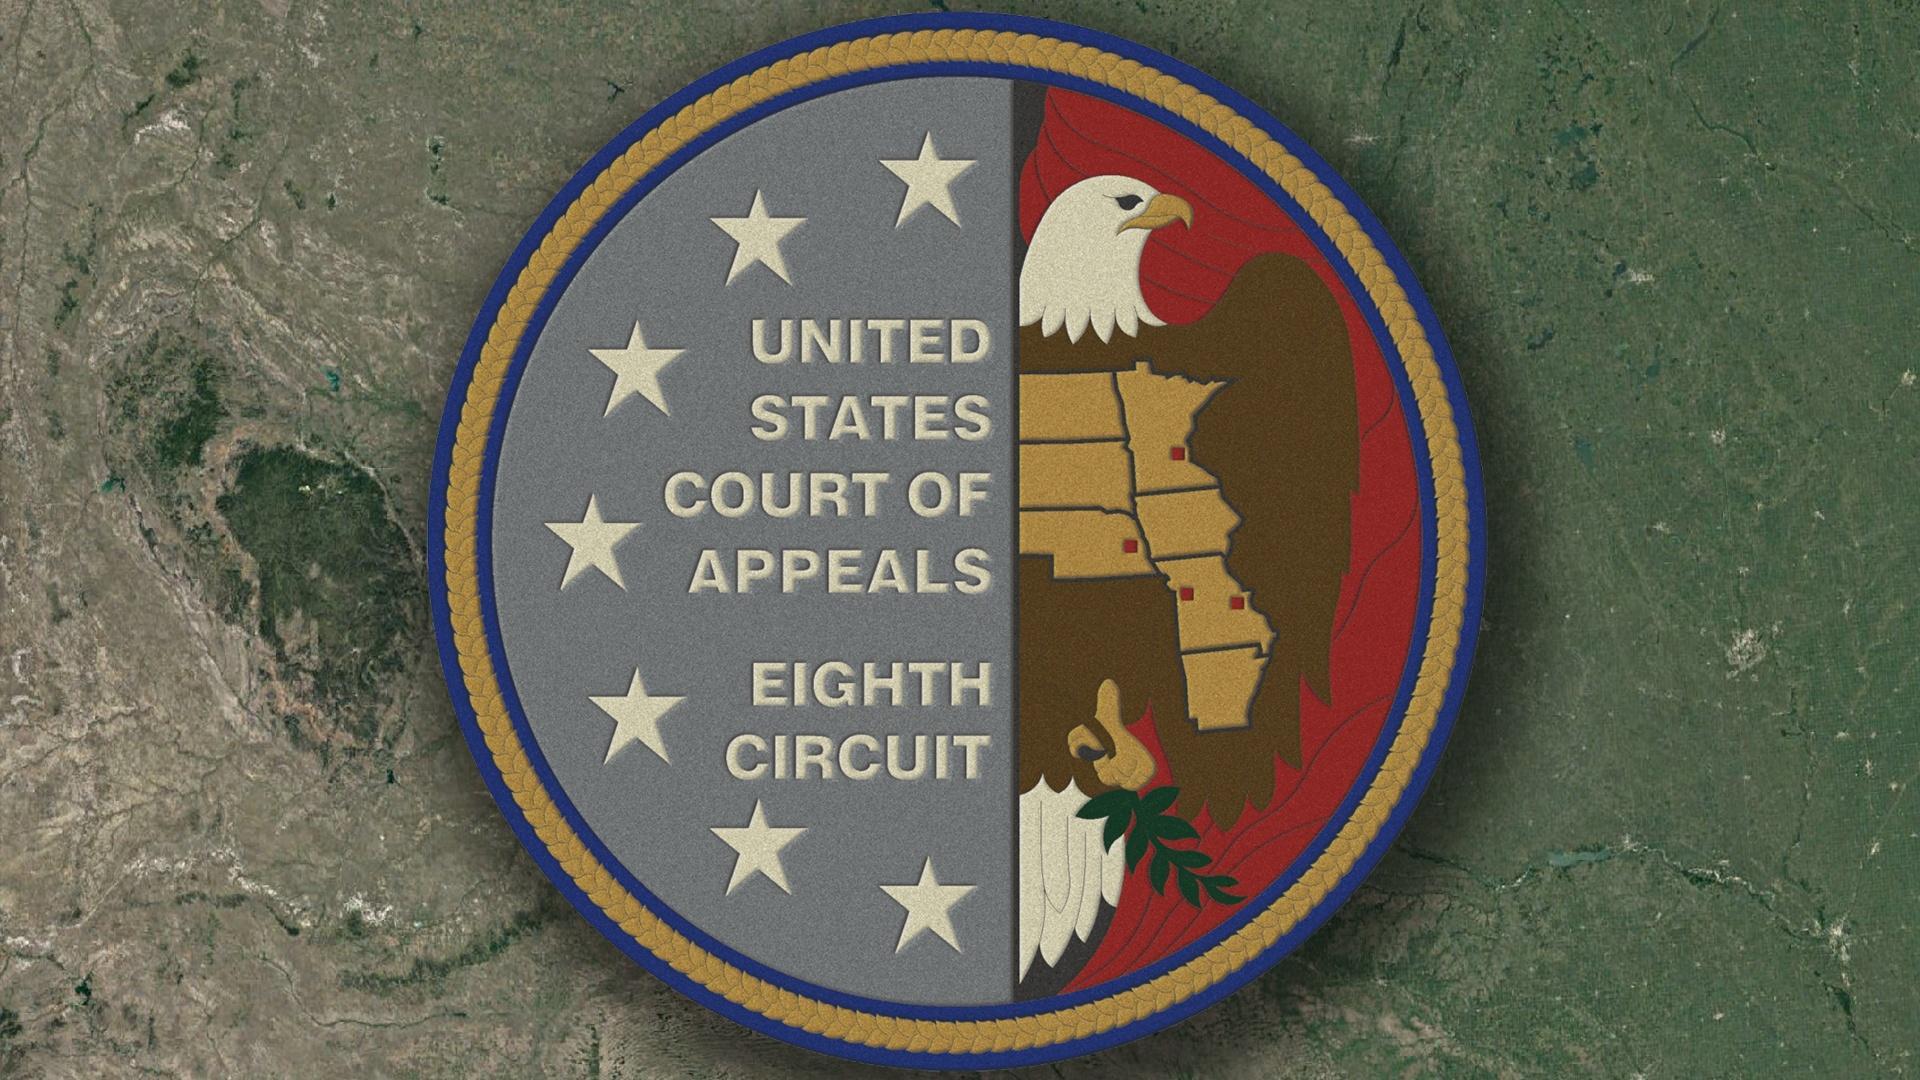 8th Circuit Court